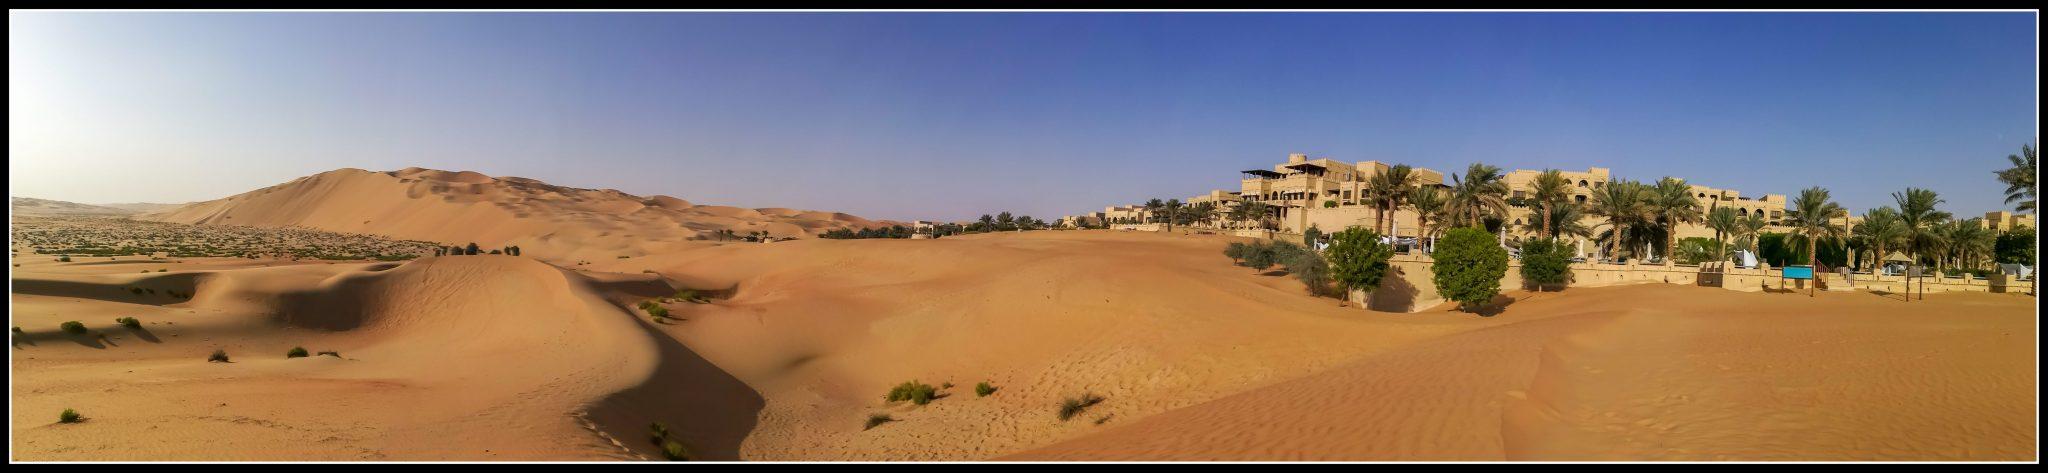 Panoramique Qasr Al Sarab